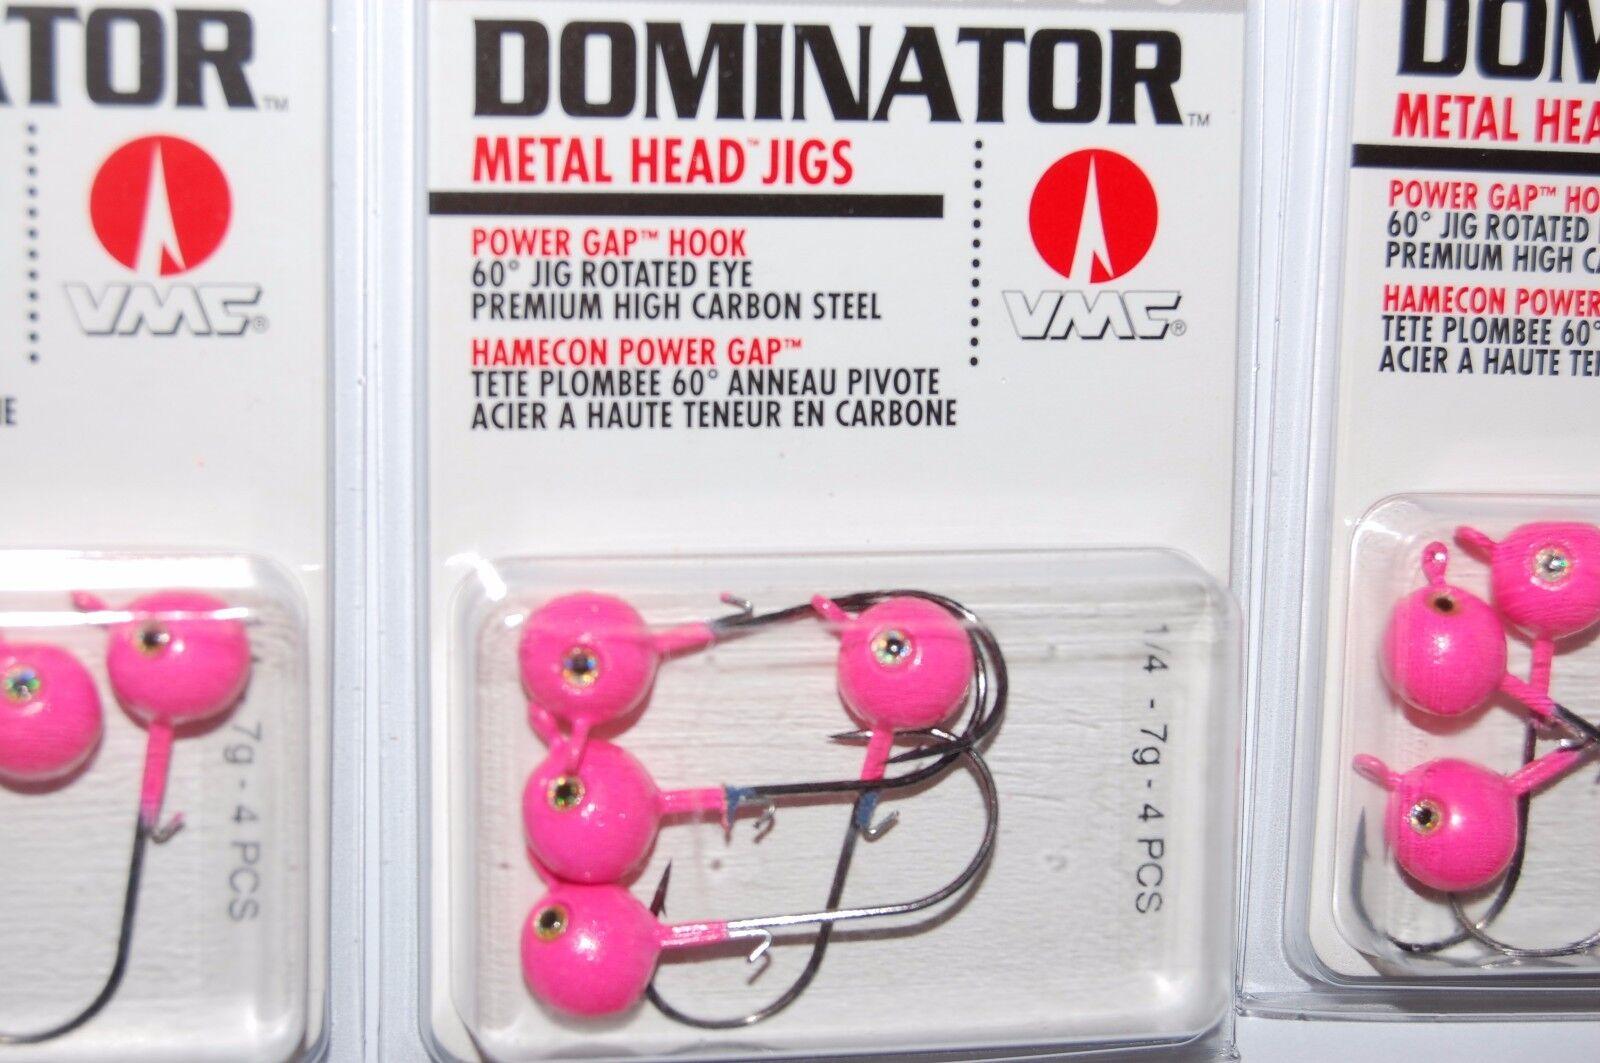 3 VMC DOMINATOR METAL HEAD JIGS 1//16 OZ HOT PINK 4PC